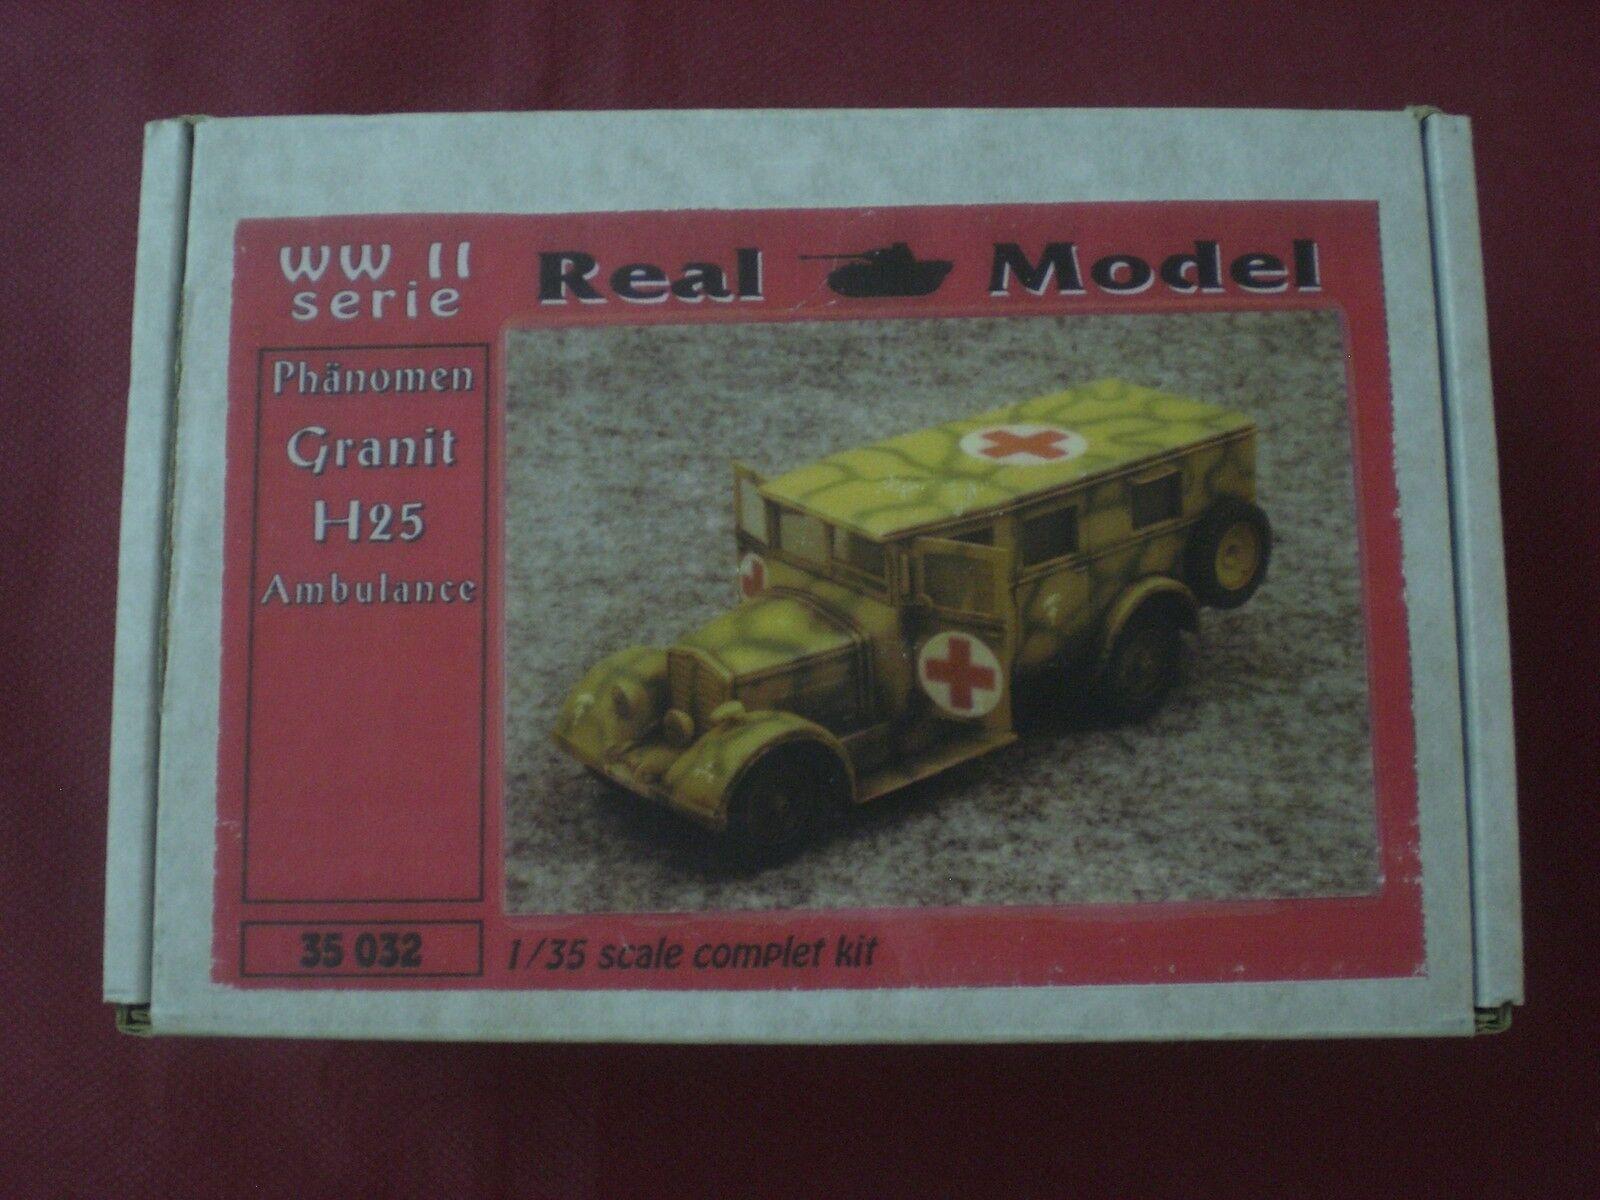 Phanomen Granit H25 Ambulance - SCALA 1 35 Real Model